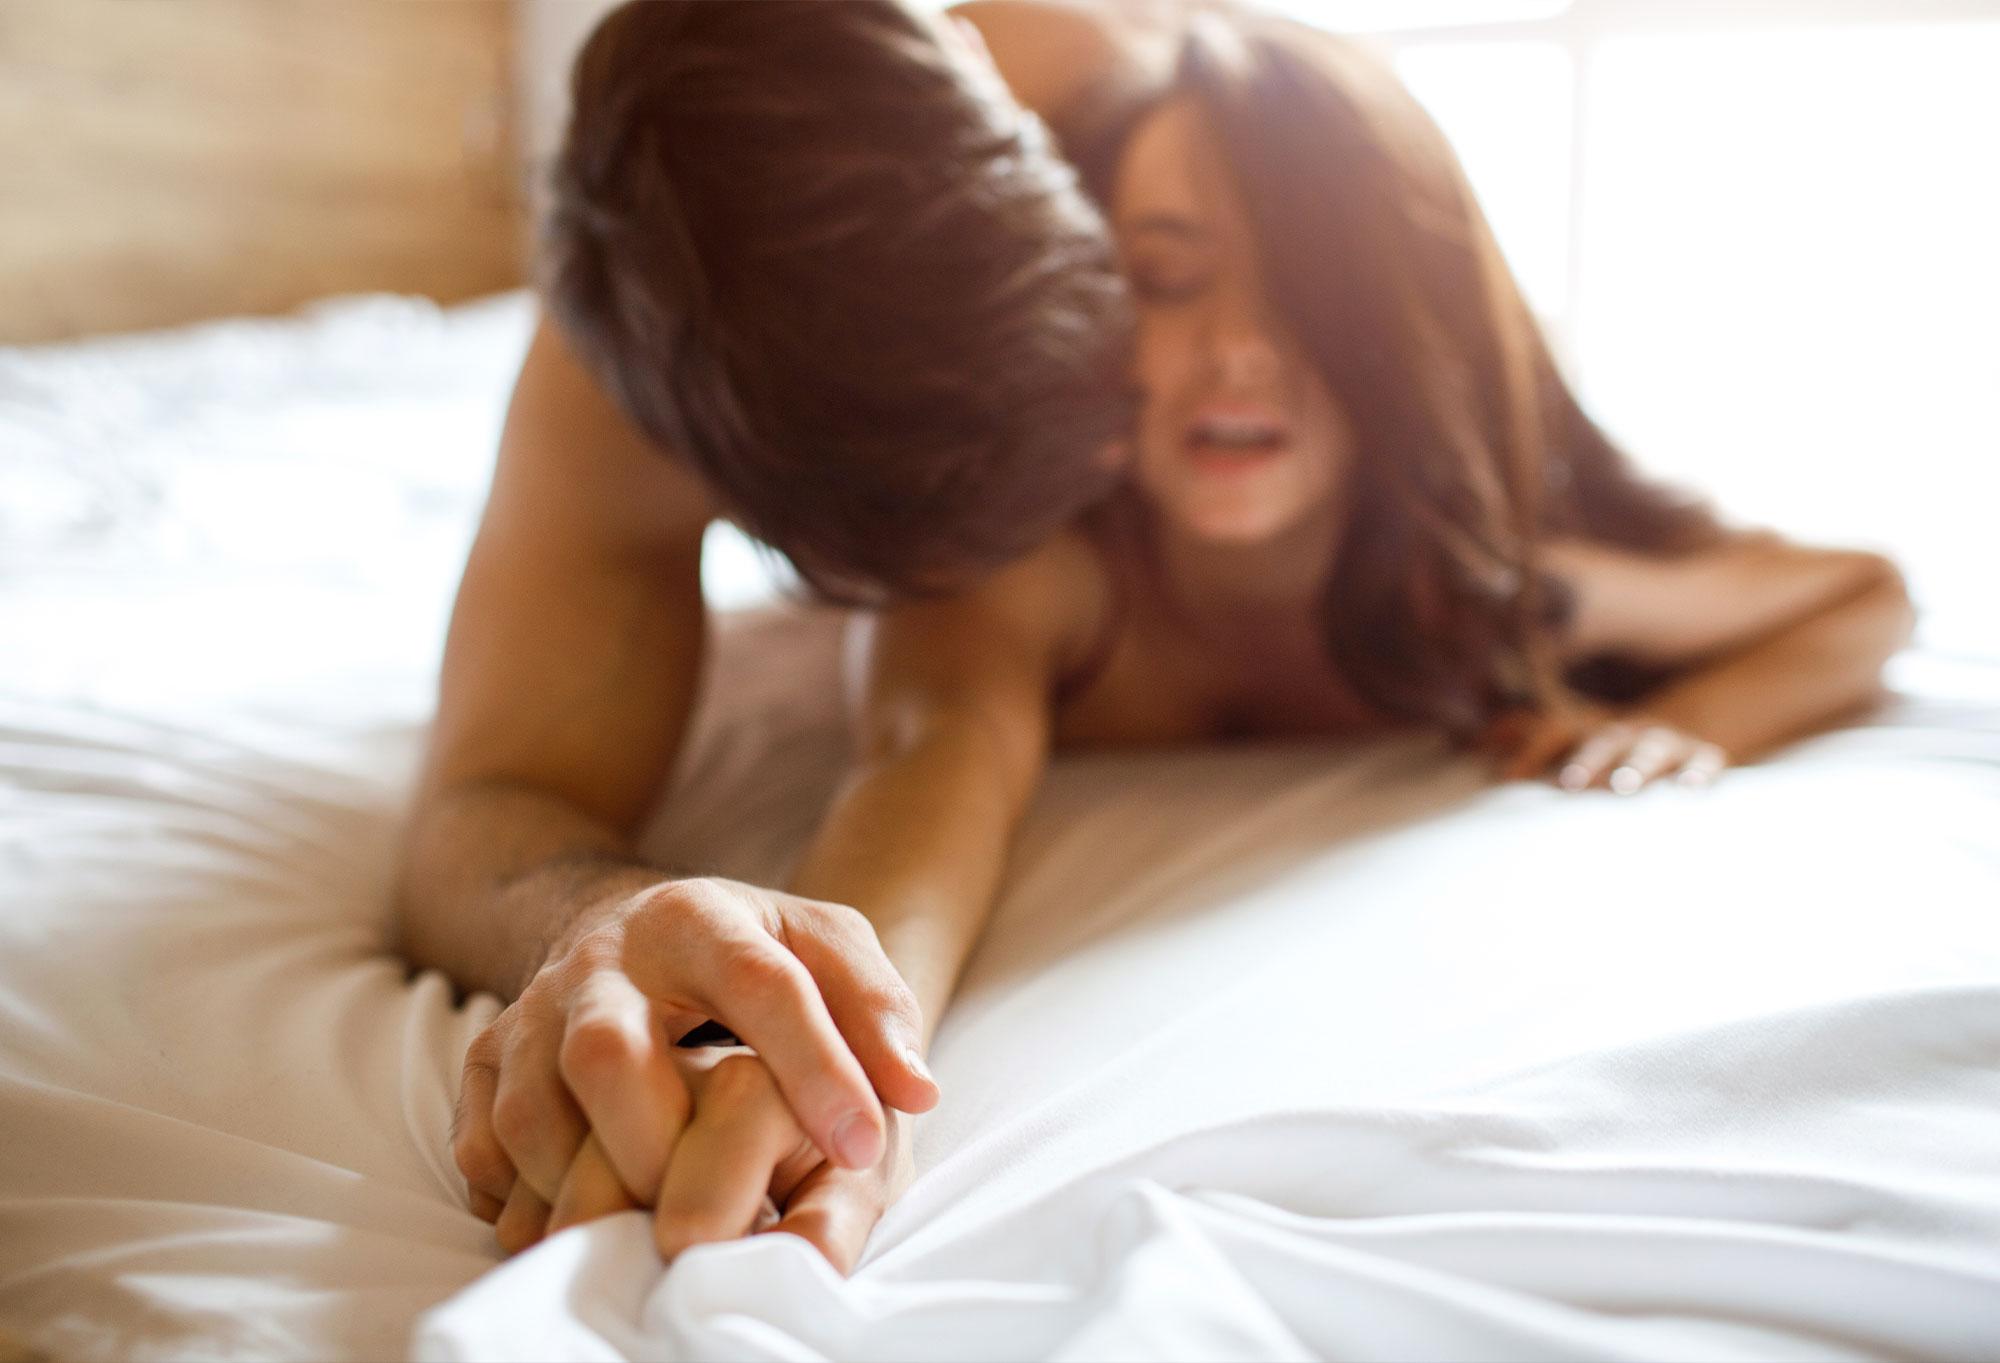 Eroticism, Fantasy and Lockdown Sex